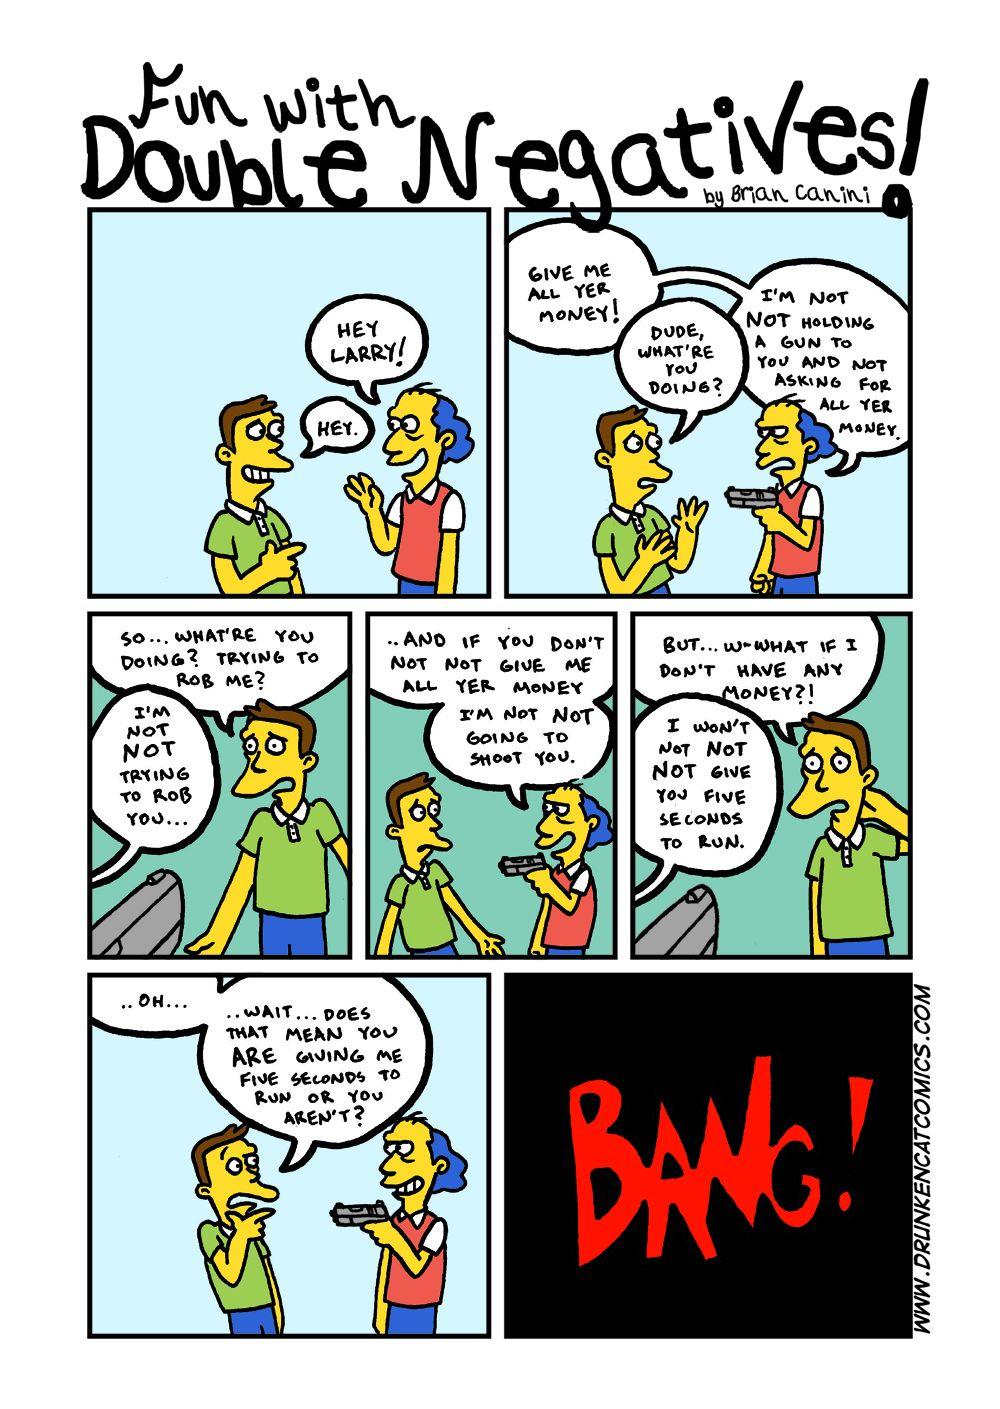 Fun With Double Negatives Double Negative Negativity Free Comics [ 1409 x 1000 Pixel ]